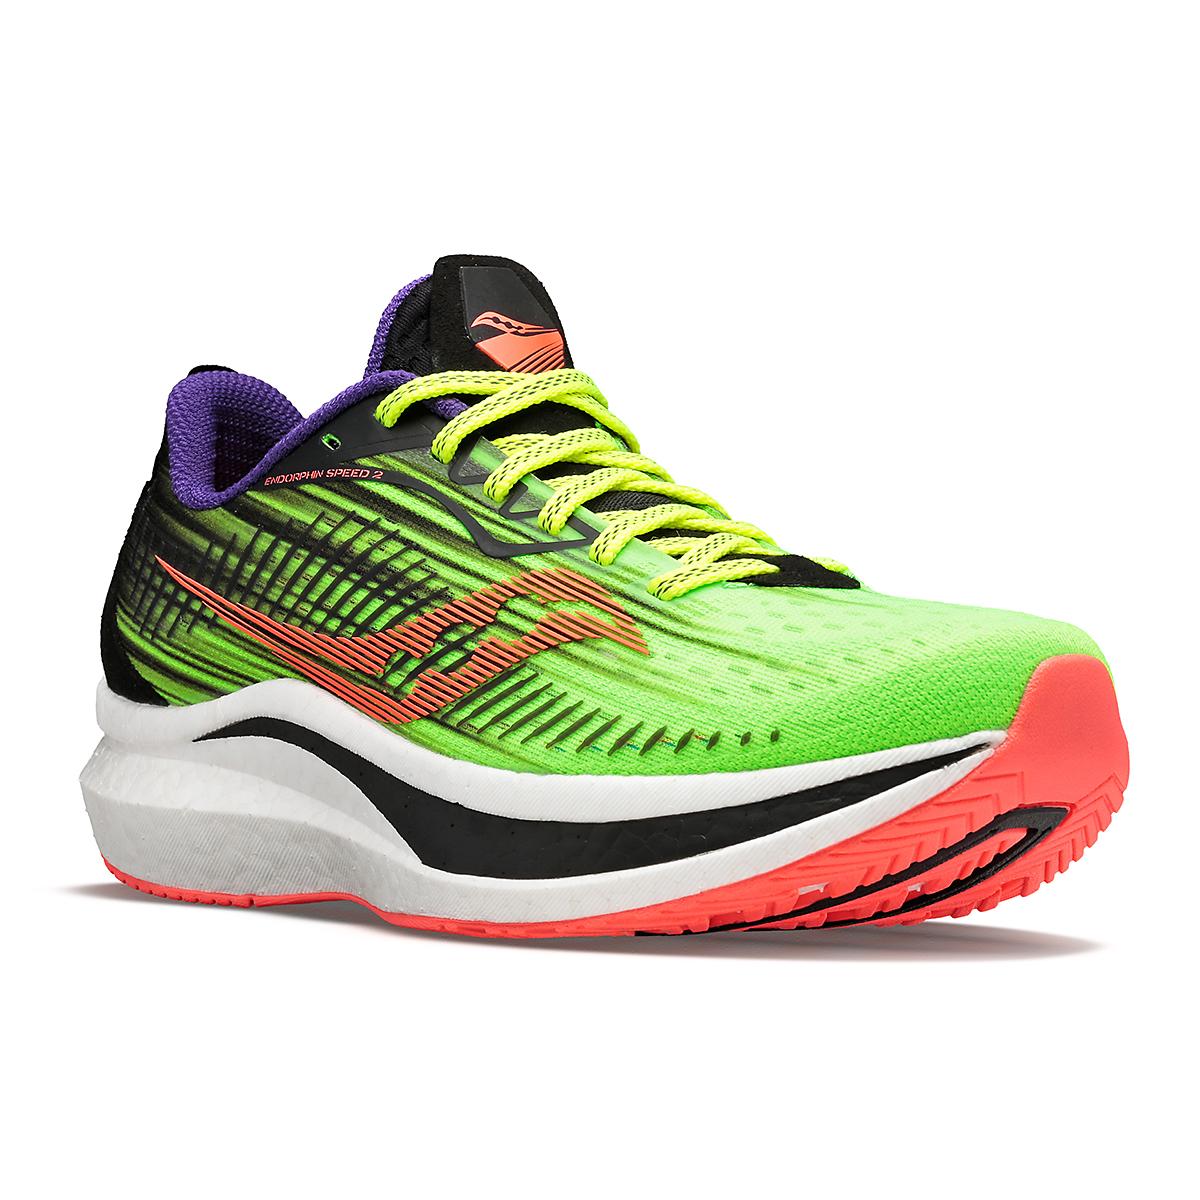 Men's Saucony Endorphin Speed 2 Running Shoe - Color: Vizipro - Size: 7 - Width: Regular, Vizipro, large, image 2